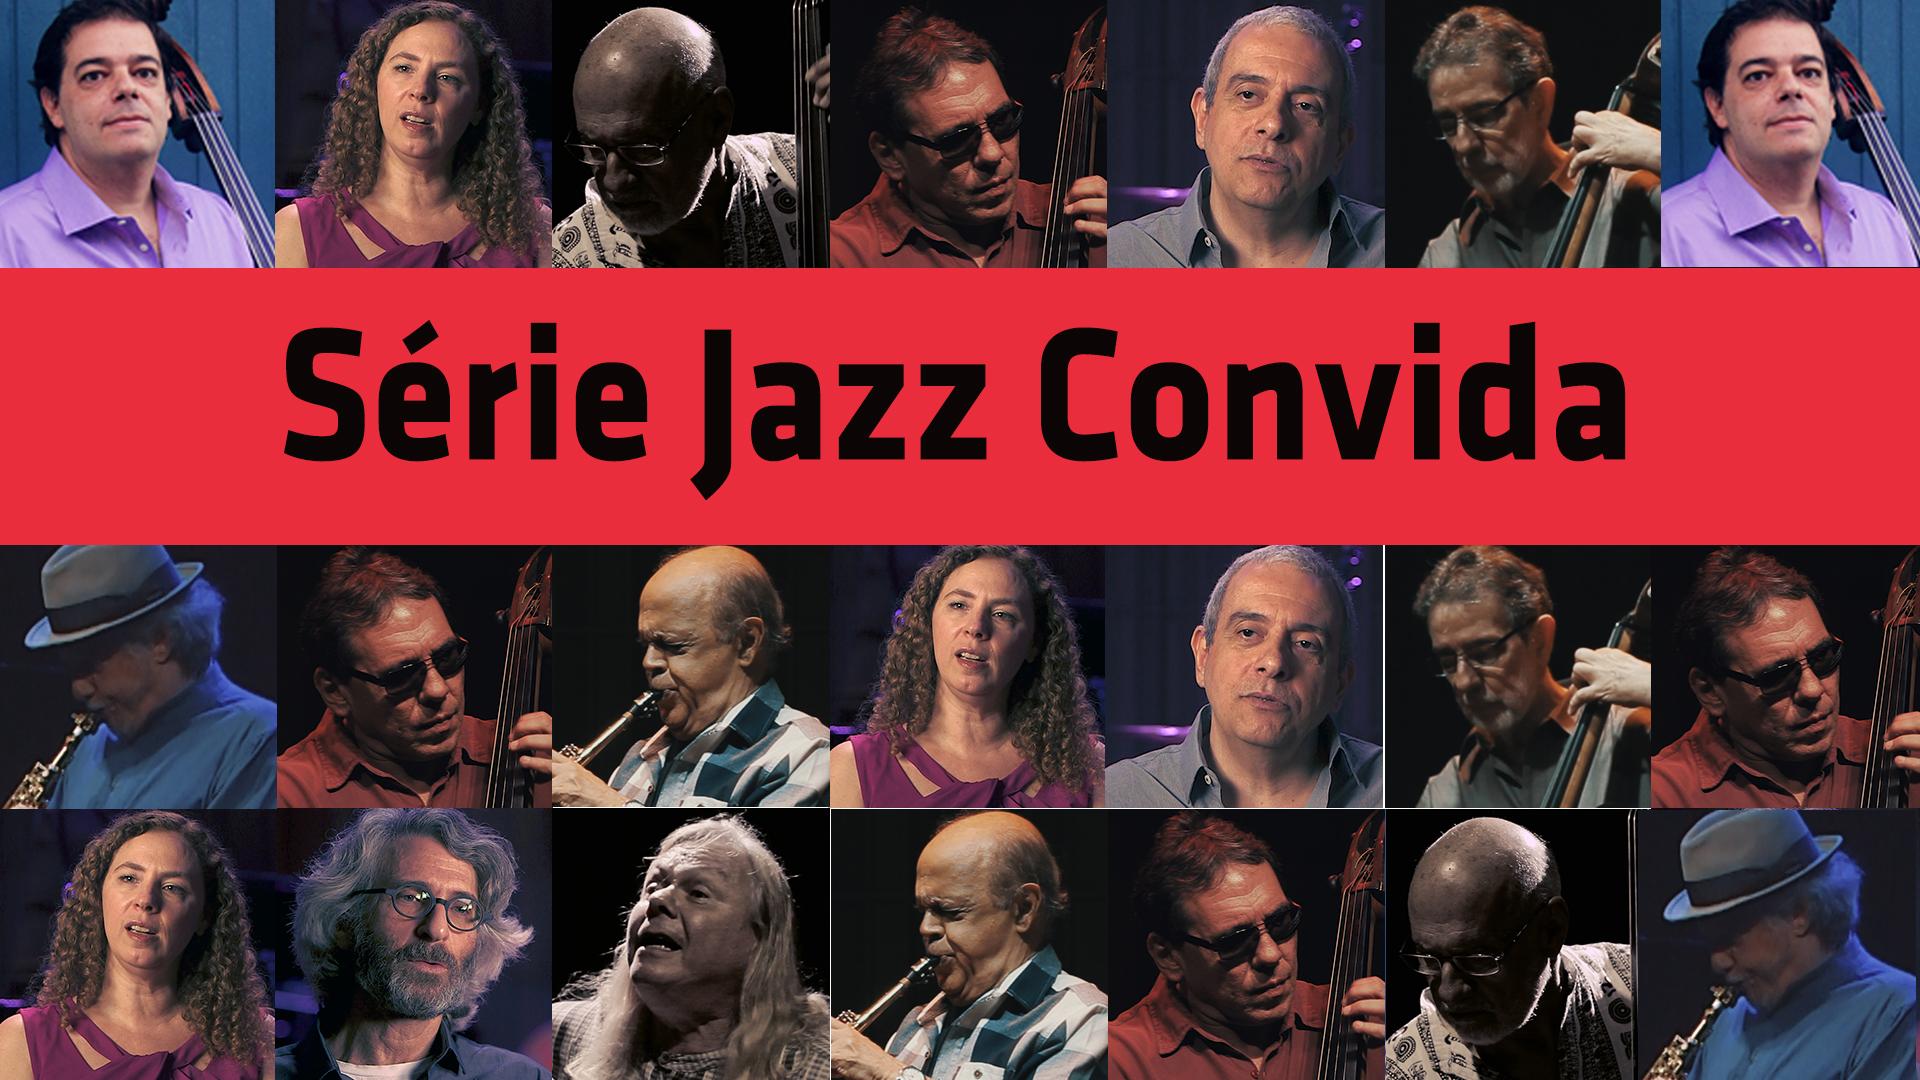 Série Jazz Convida